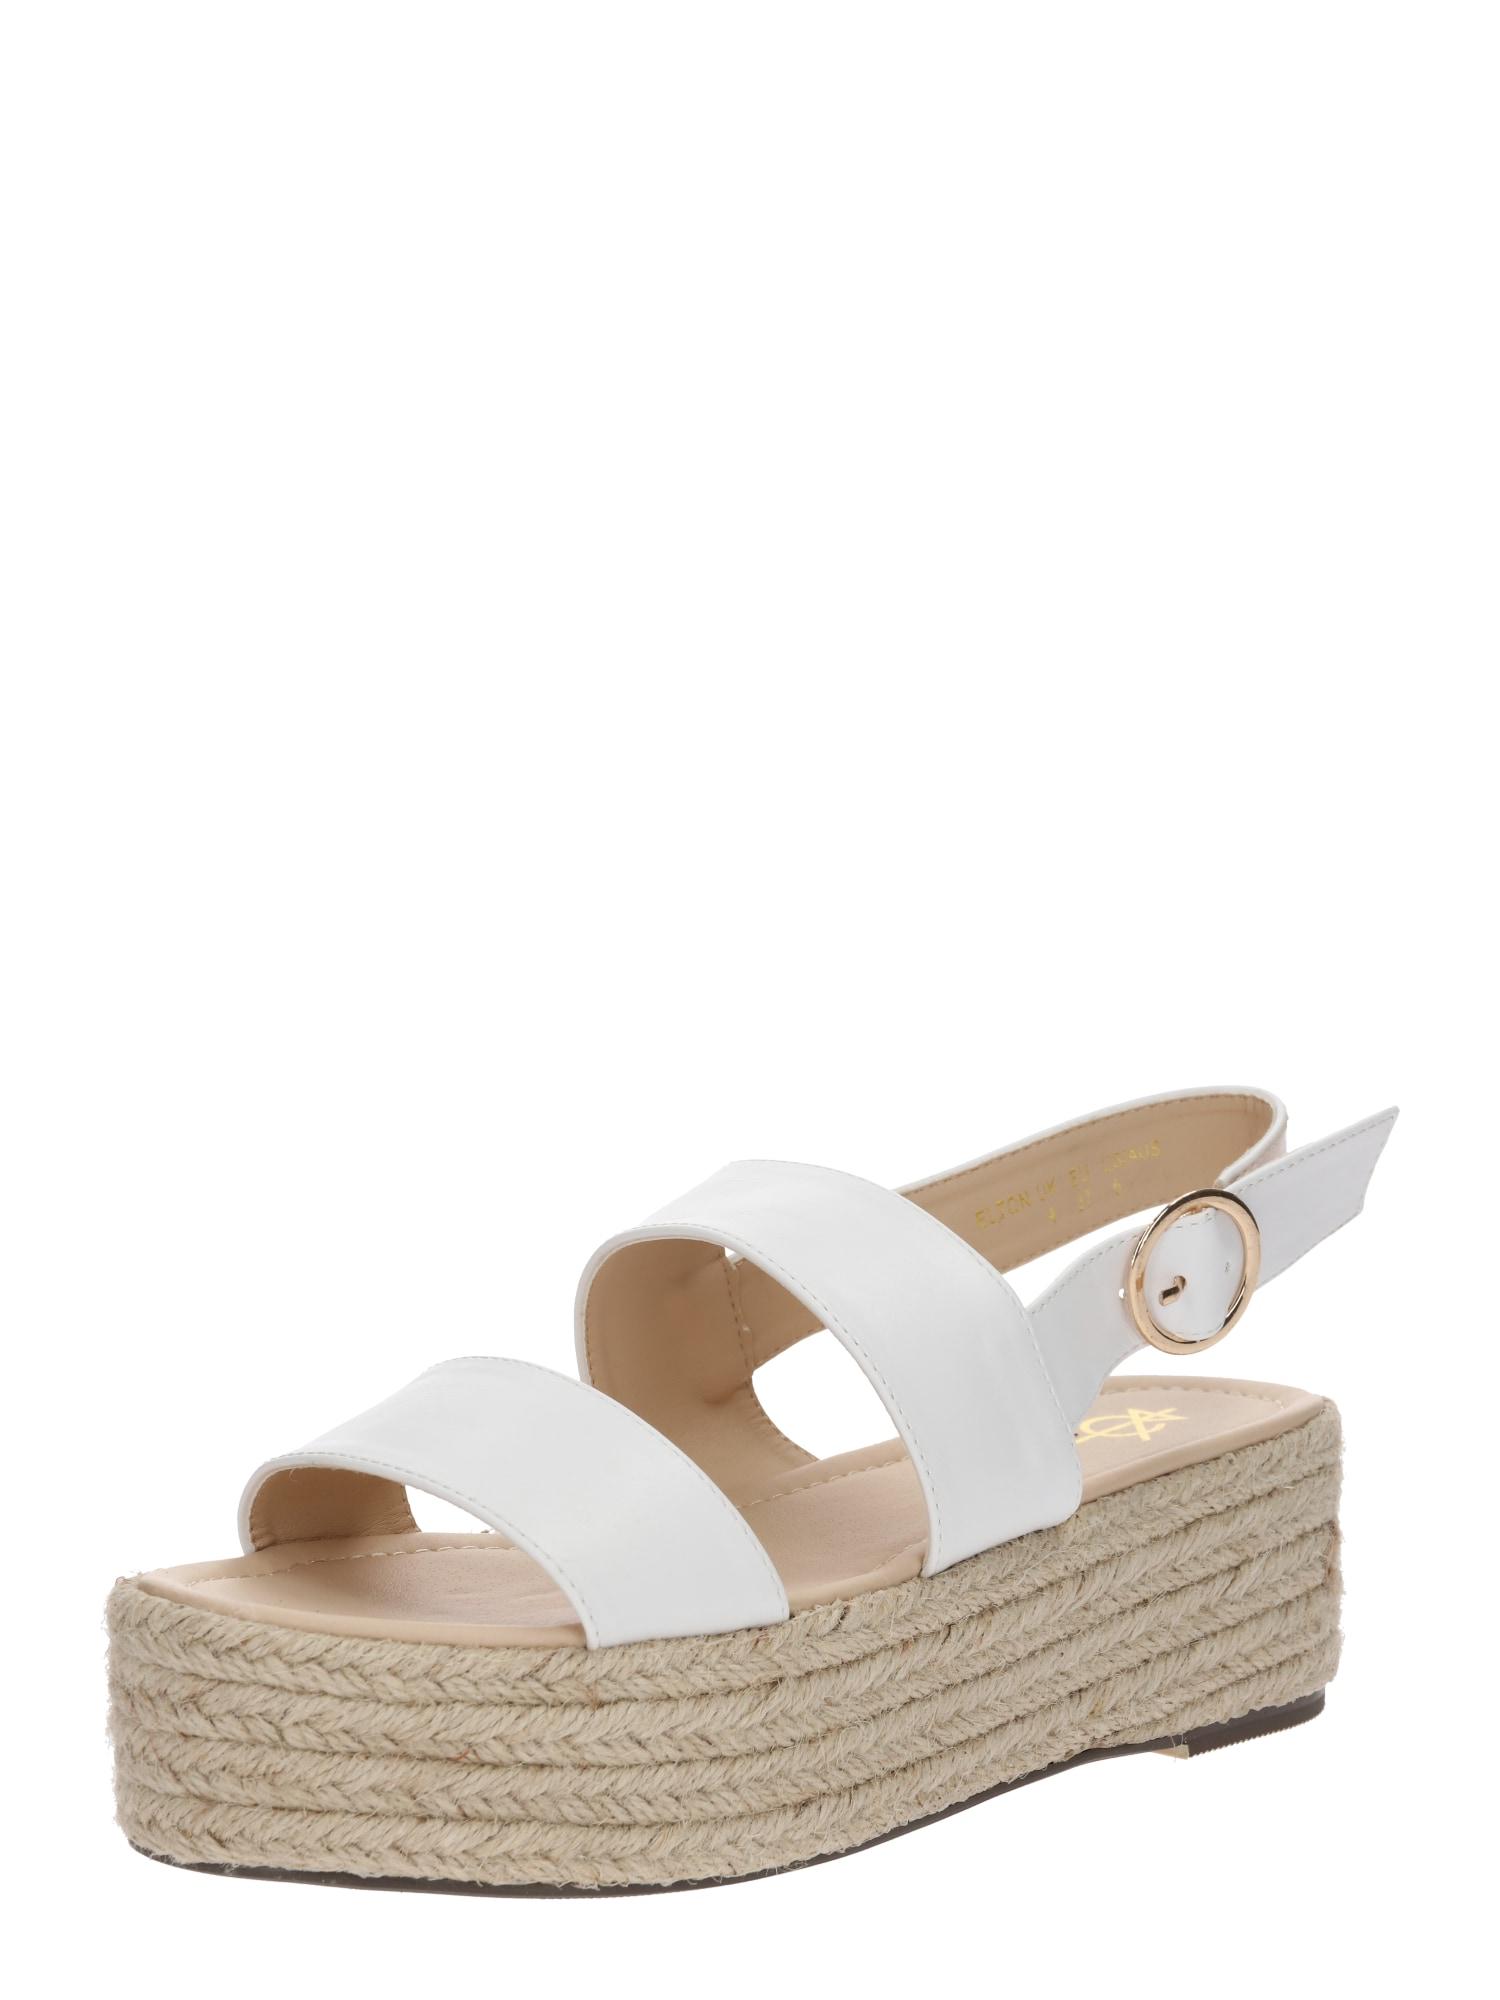 Páskové sandály ELTON bílá 4th & Reckless